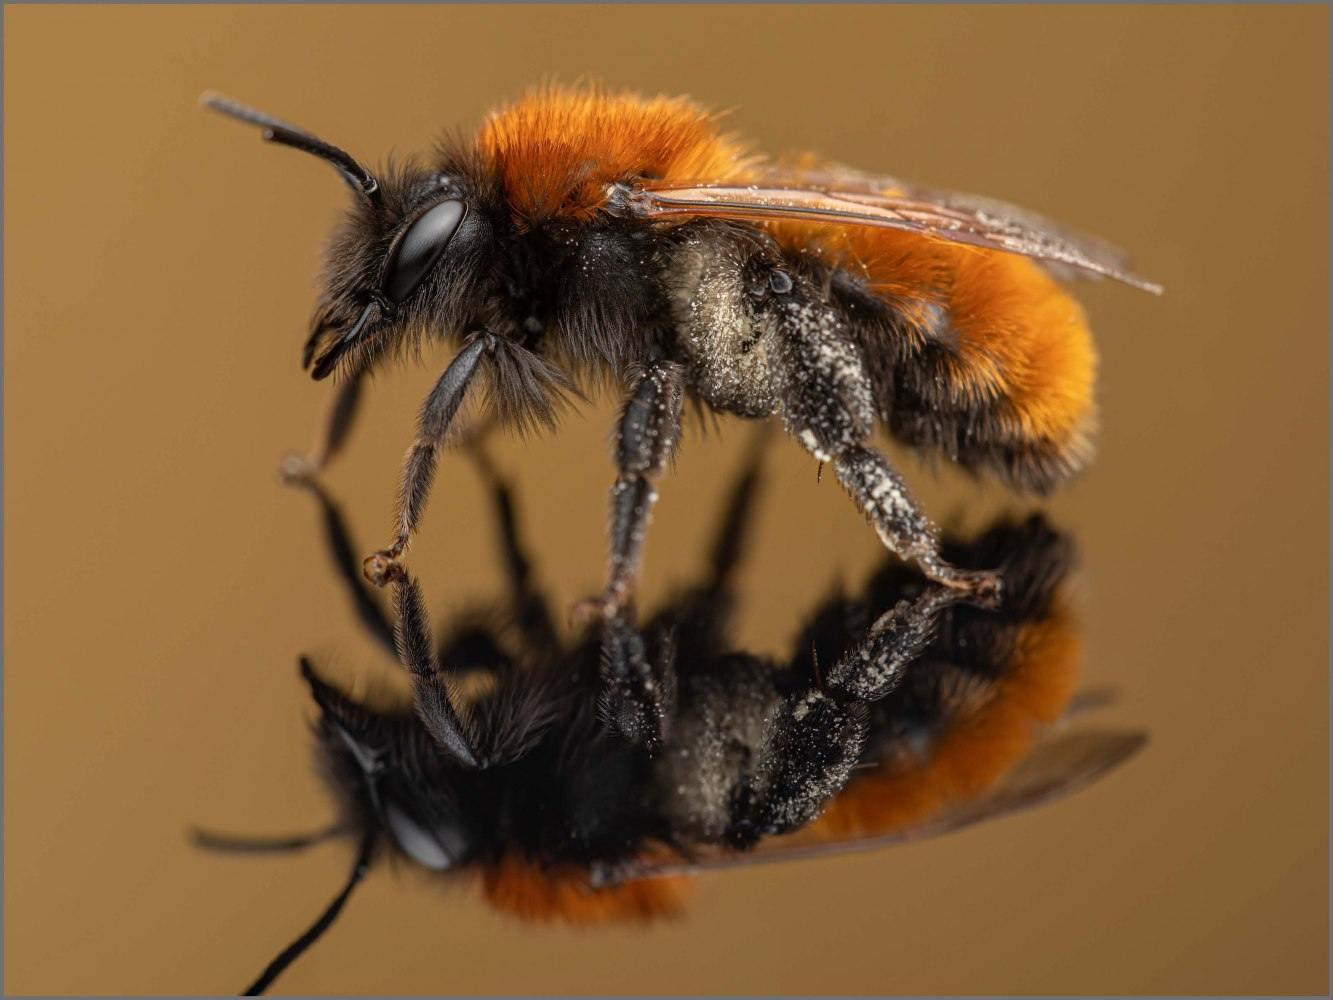 Andrena-fulva-female-Muller-1766-1